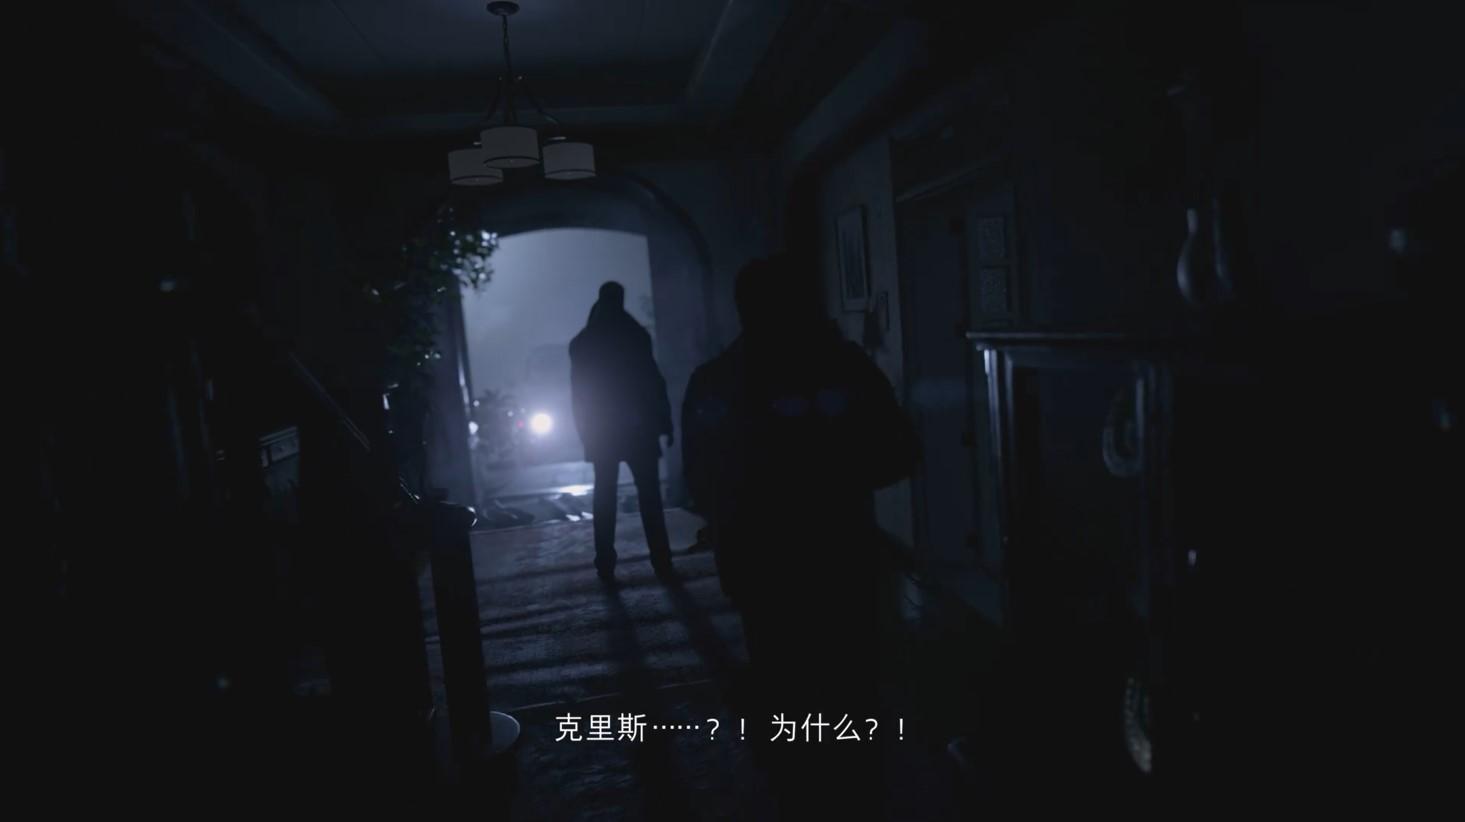 PS5游戏发布会:《生化危机8:村庄》新宣传片公开